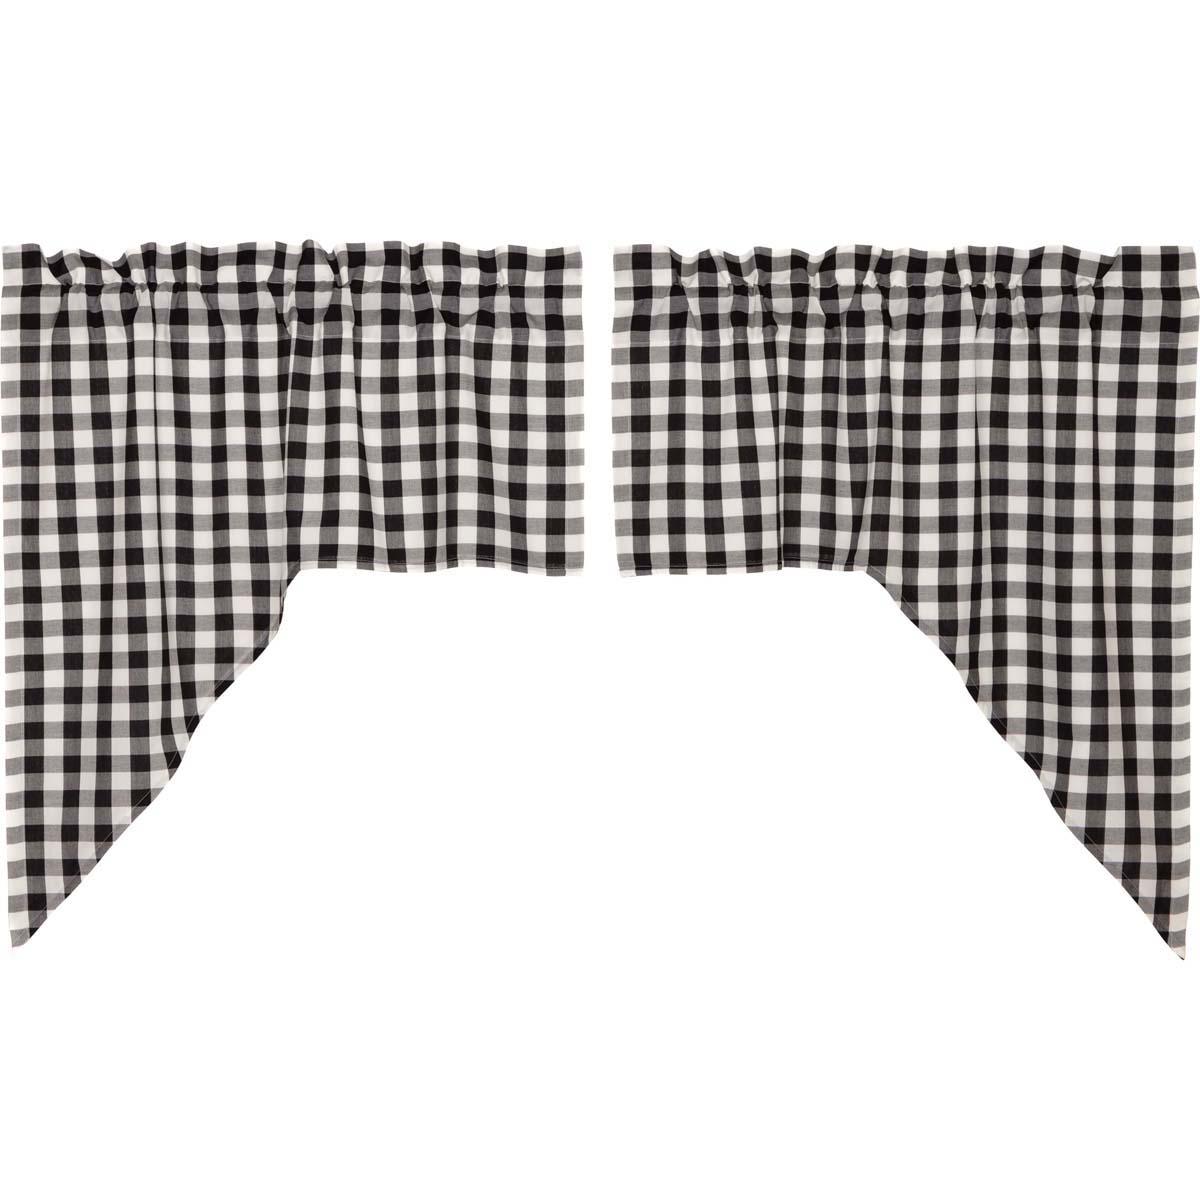 Vhc Brands Classic Country Farmhouse Kitchen Window Curtains Annie Buffalo Check White Lined Swag Pair Black Walmart Com Walmart Com